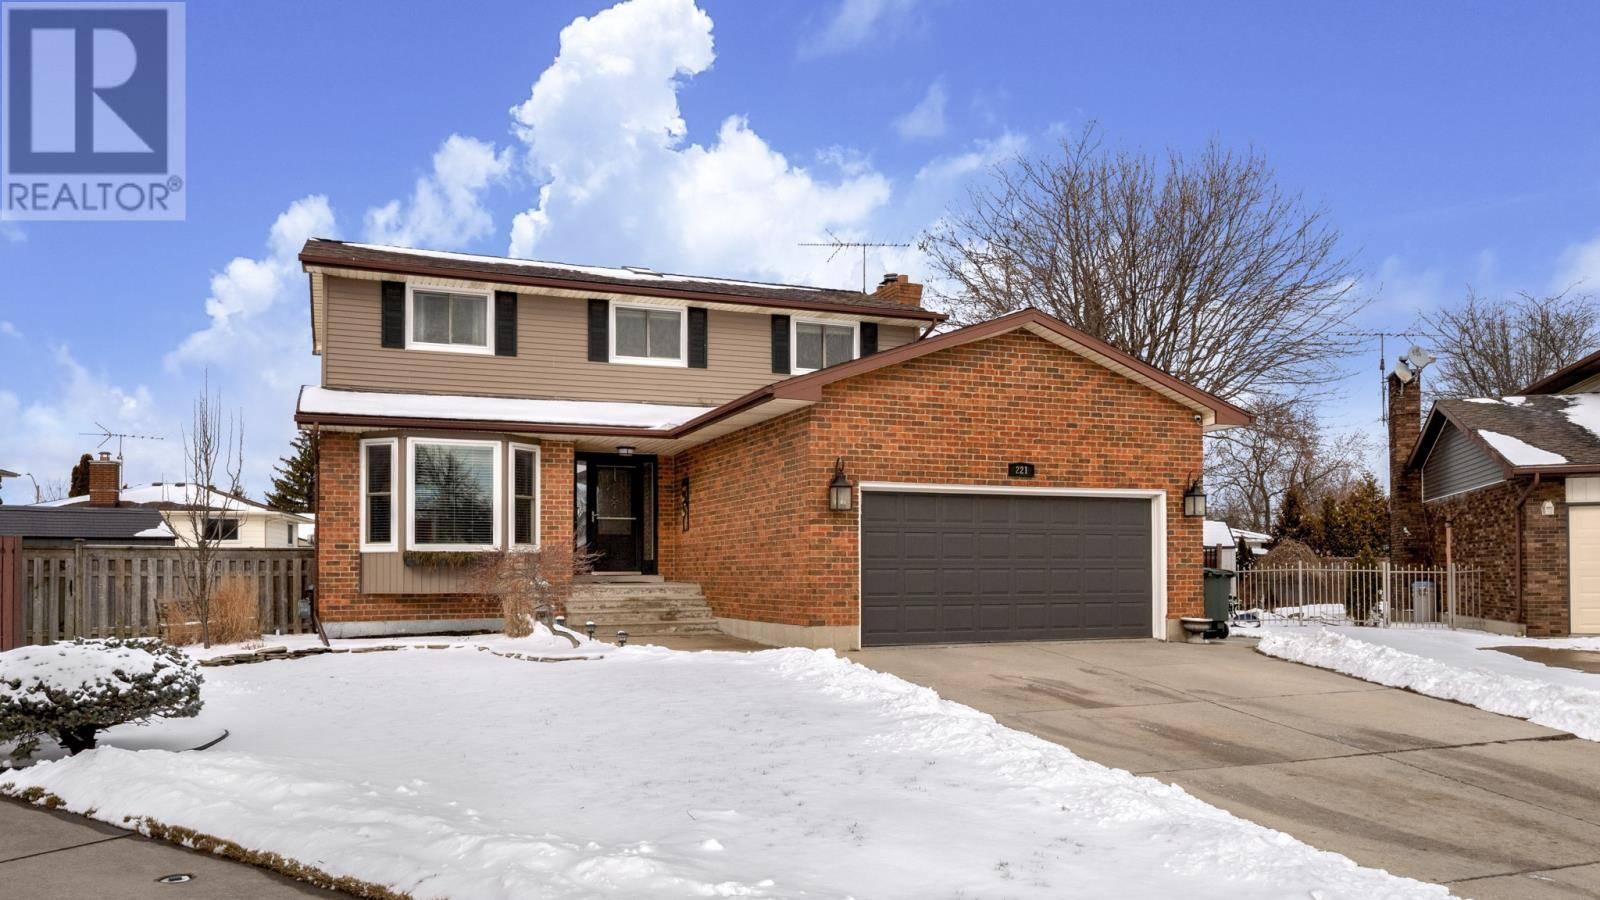 House for sale at 221 Donalda  Tecumseh Ontario - MLS: 20001836